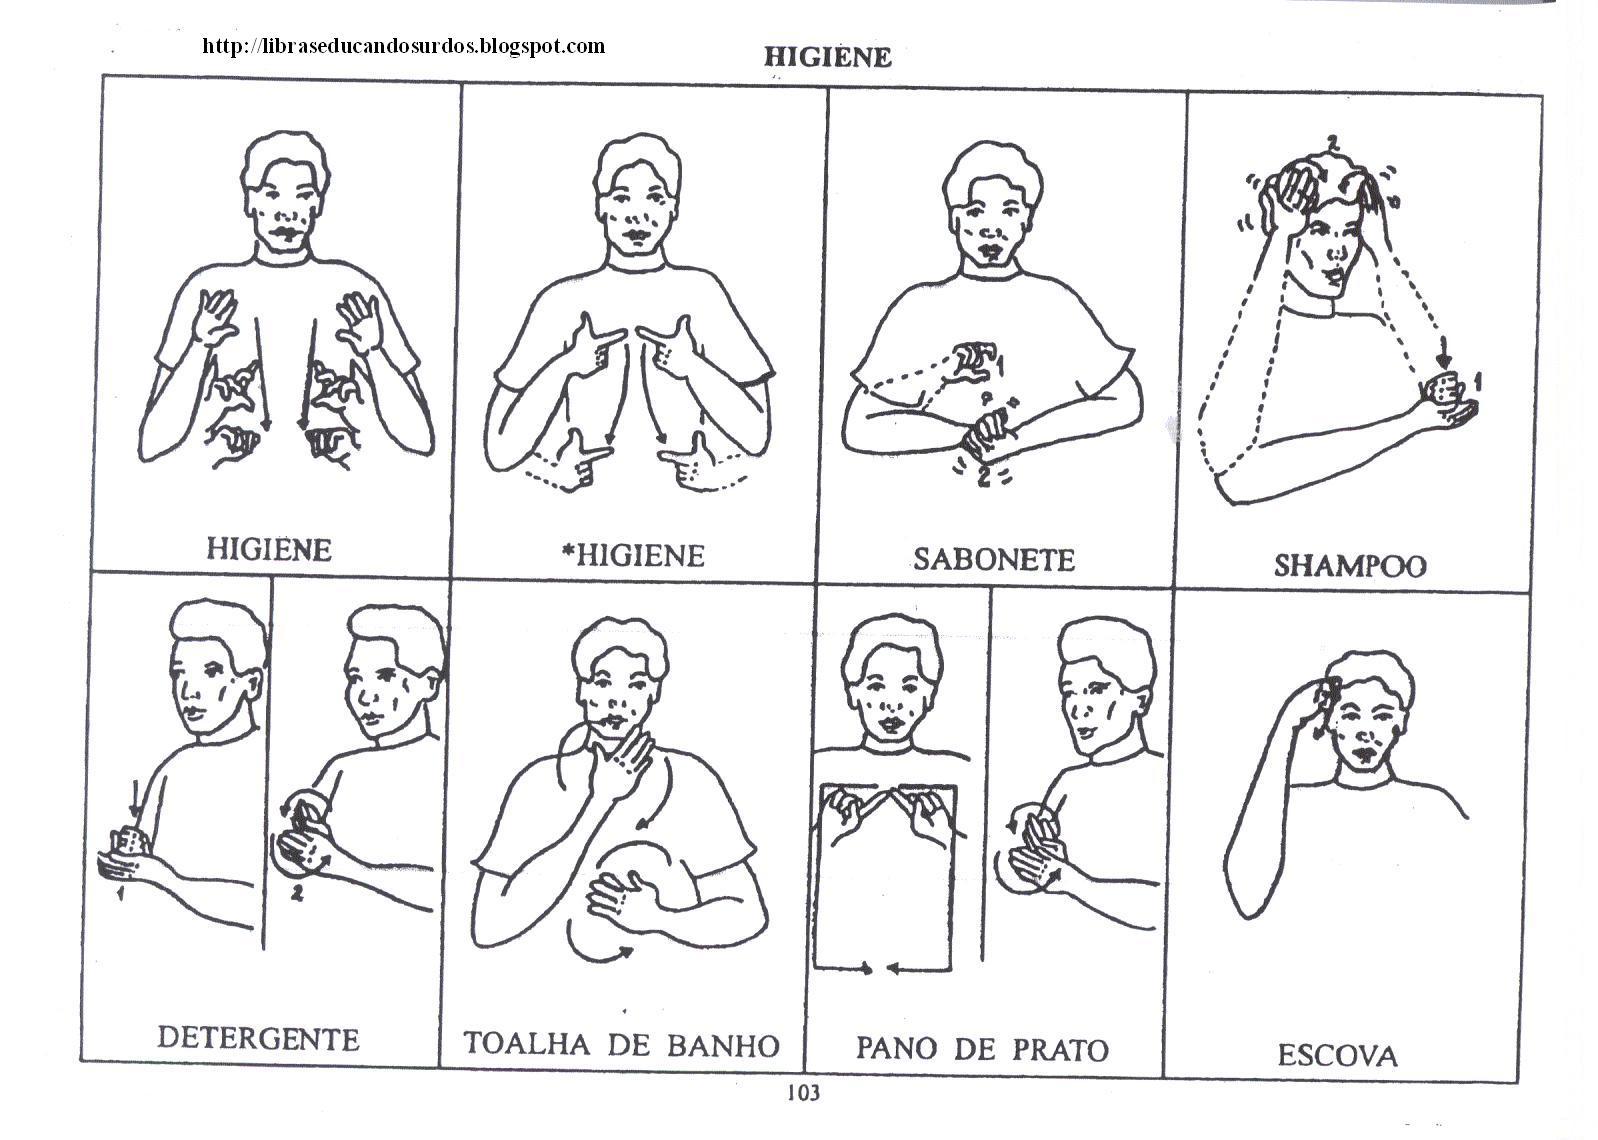 LIBRAS: Educandos Surdos: Sinais de Higiene #535158 1598 1140